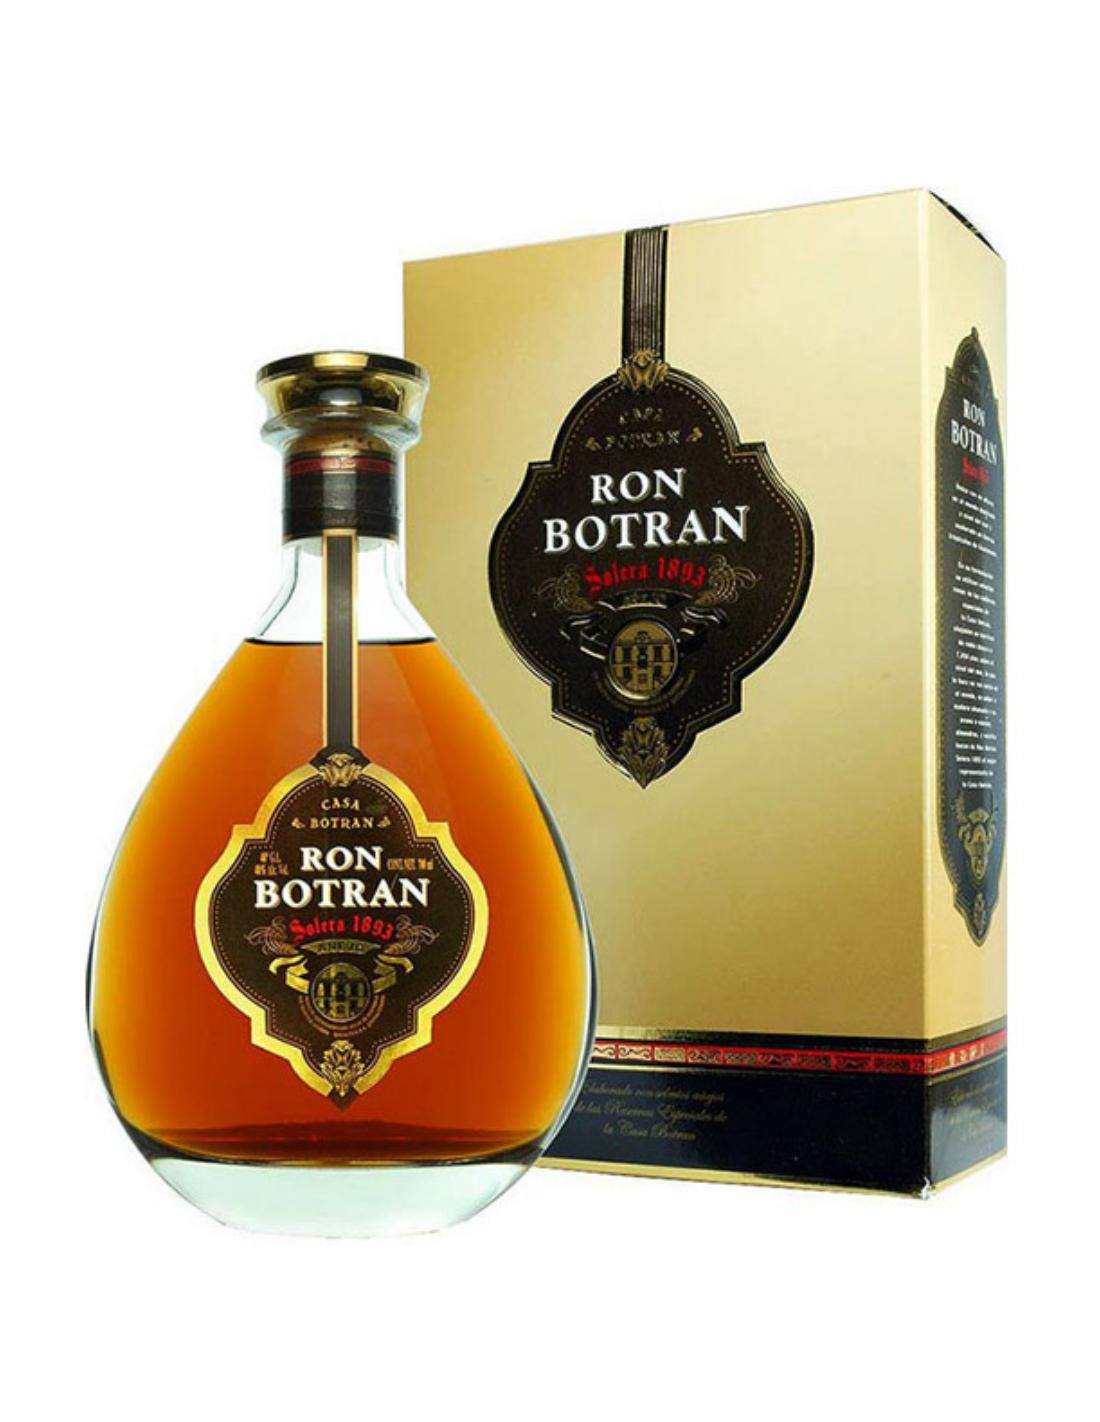 Rom Ron Botran Solera 1893 Decanter + cutie, 40% alc., 0.7L, Guatemala